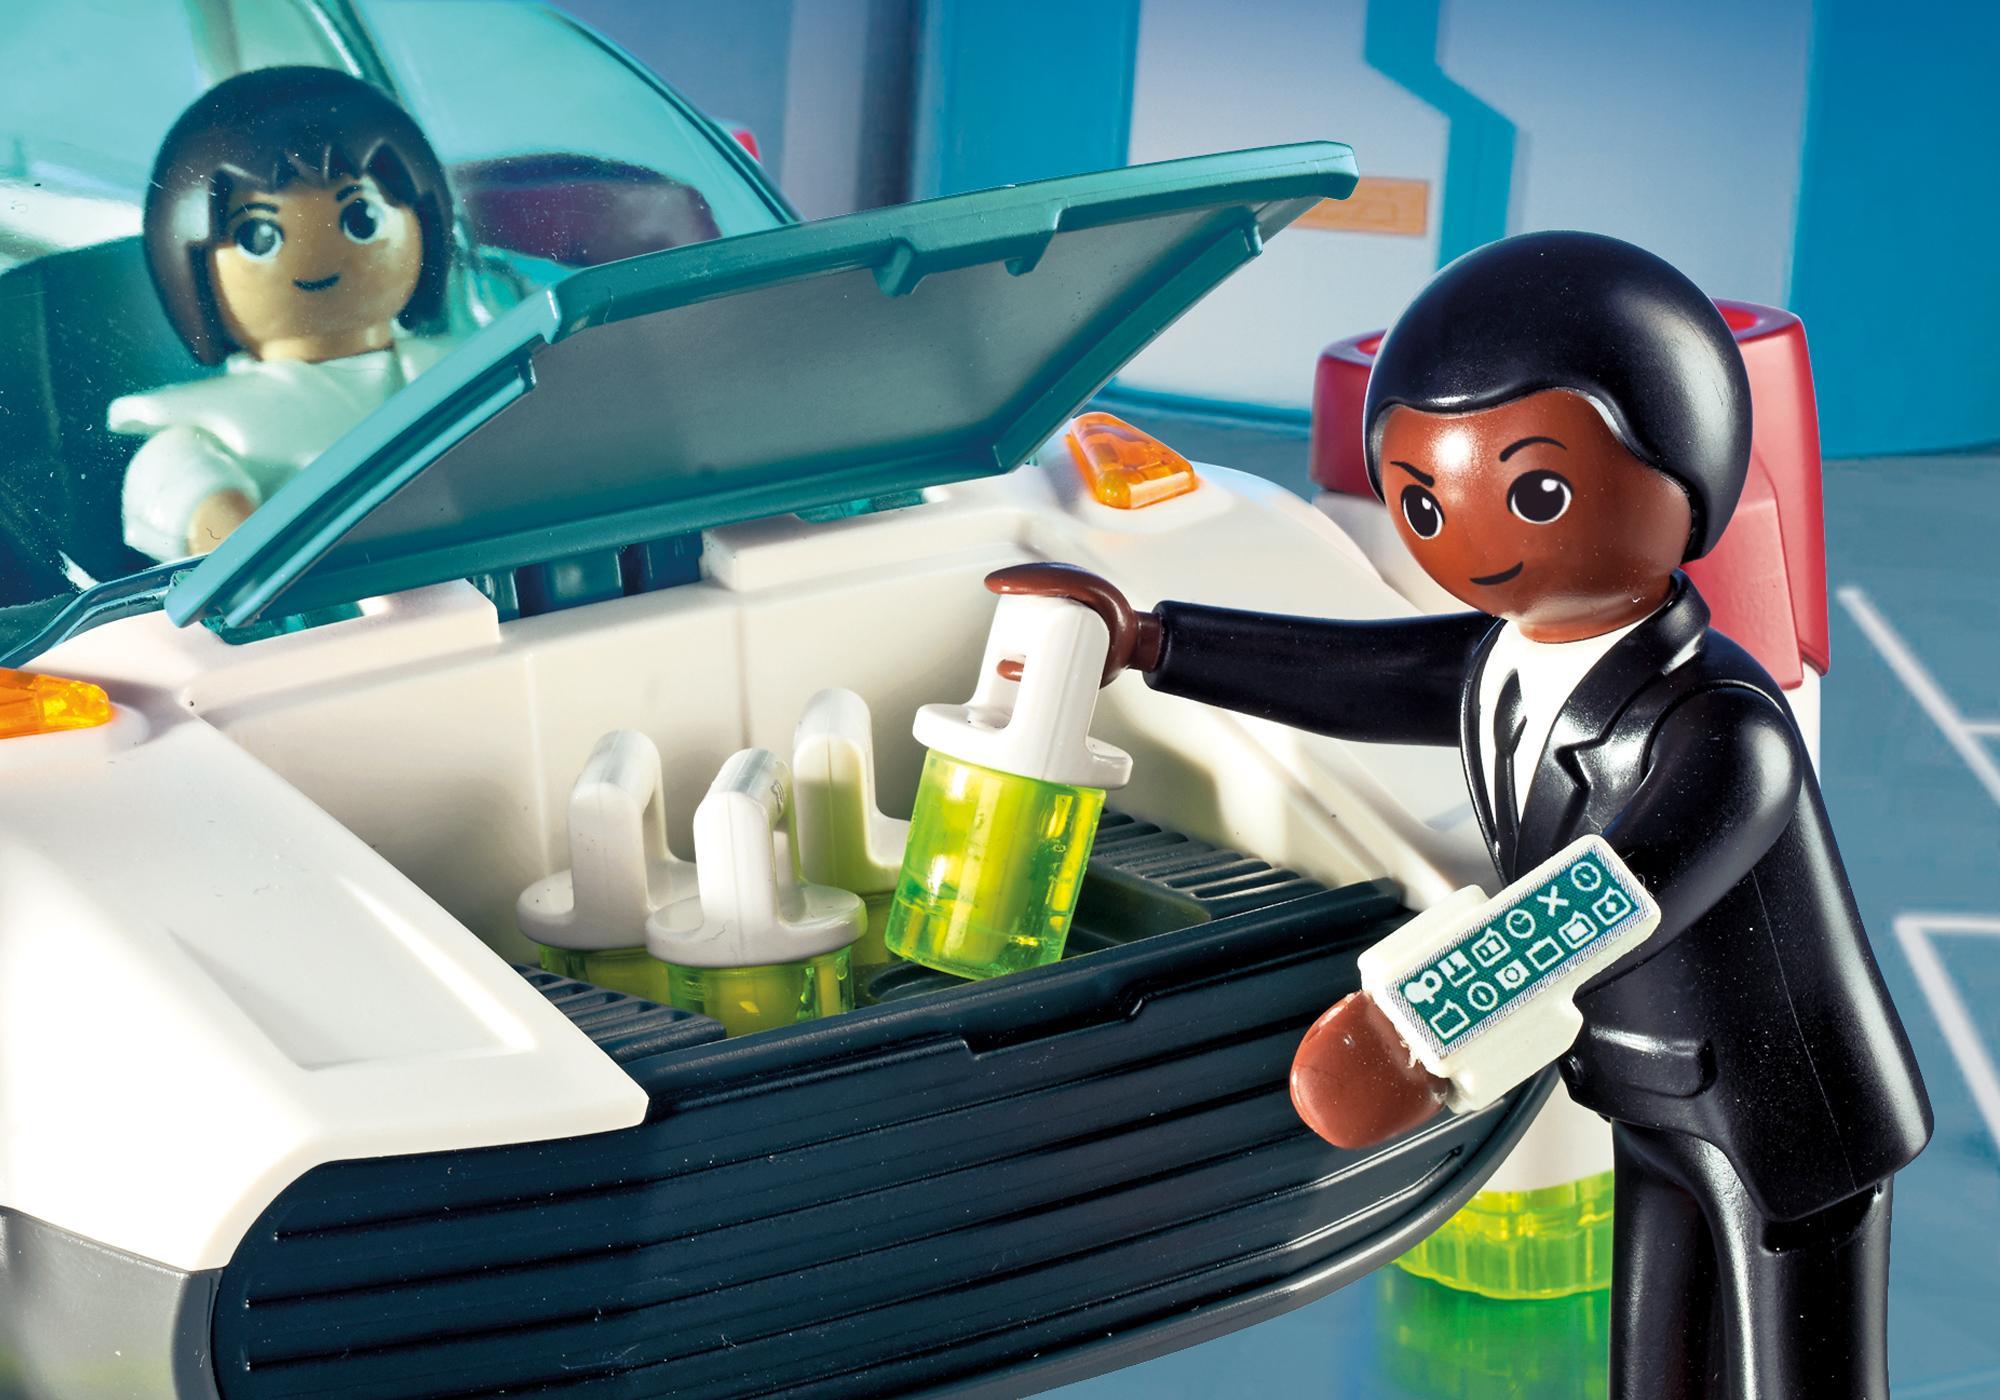 http://media.playmobil.com/i/playmobil/9002_product_extra1